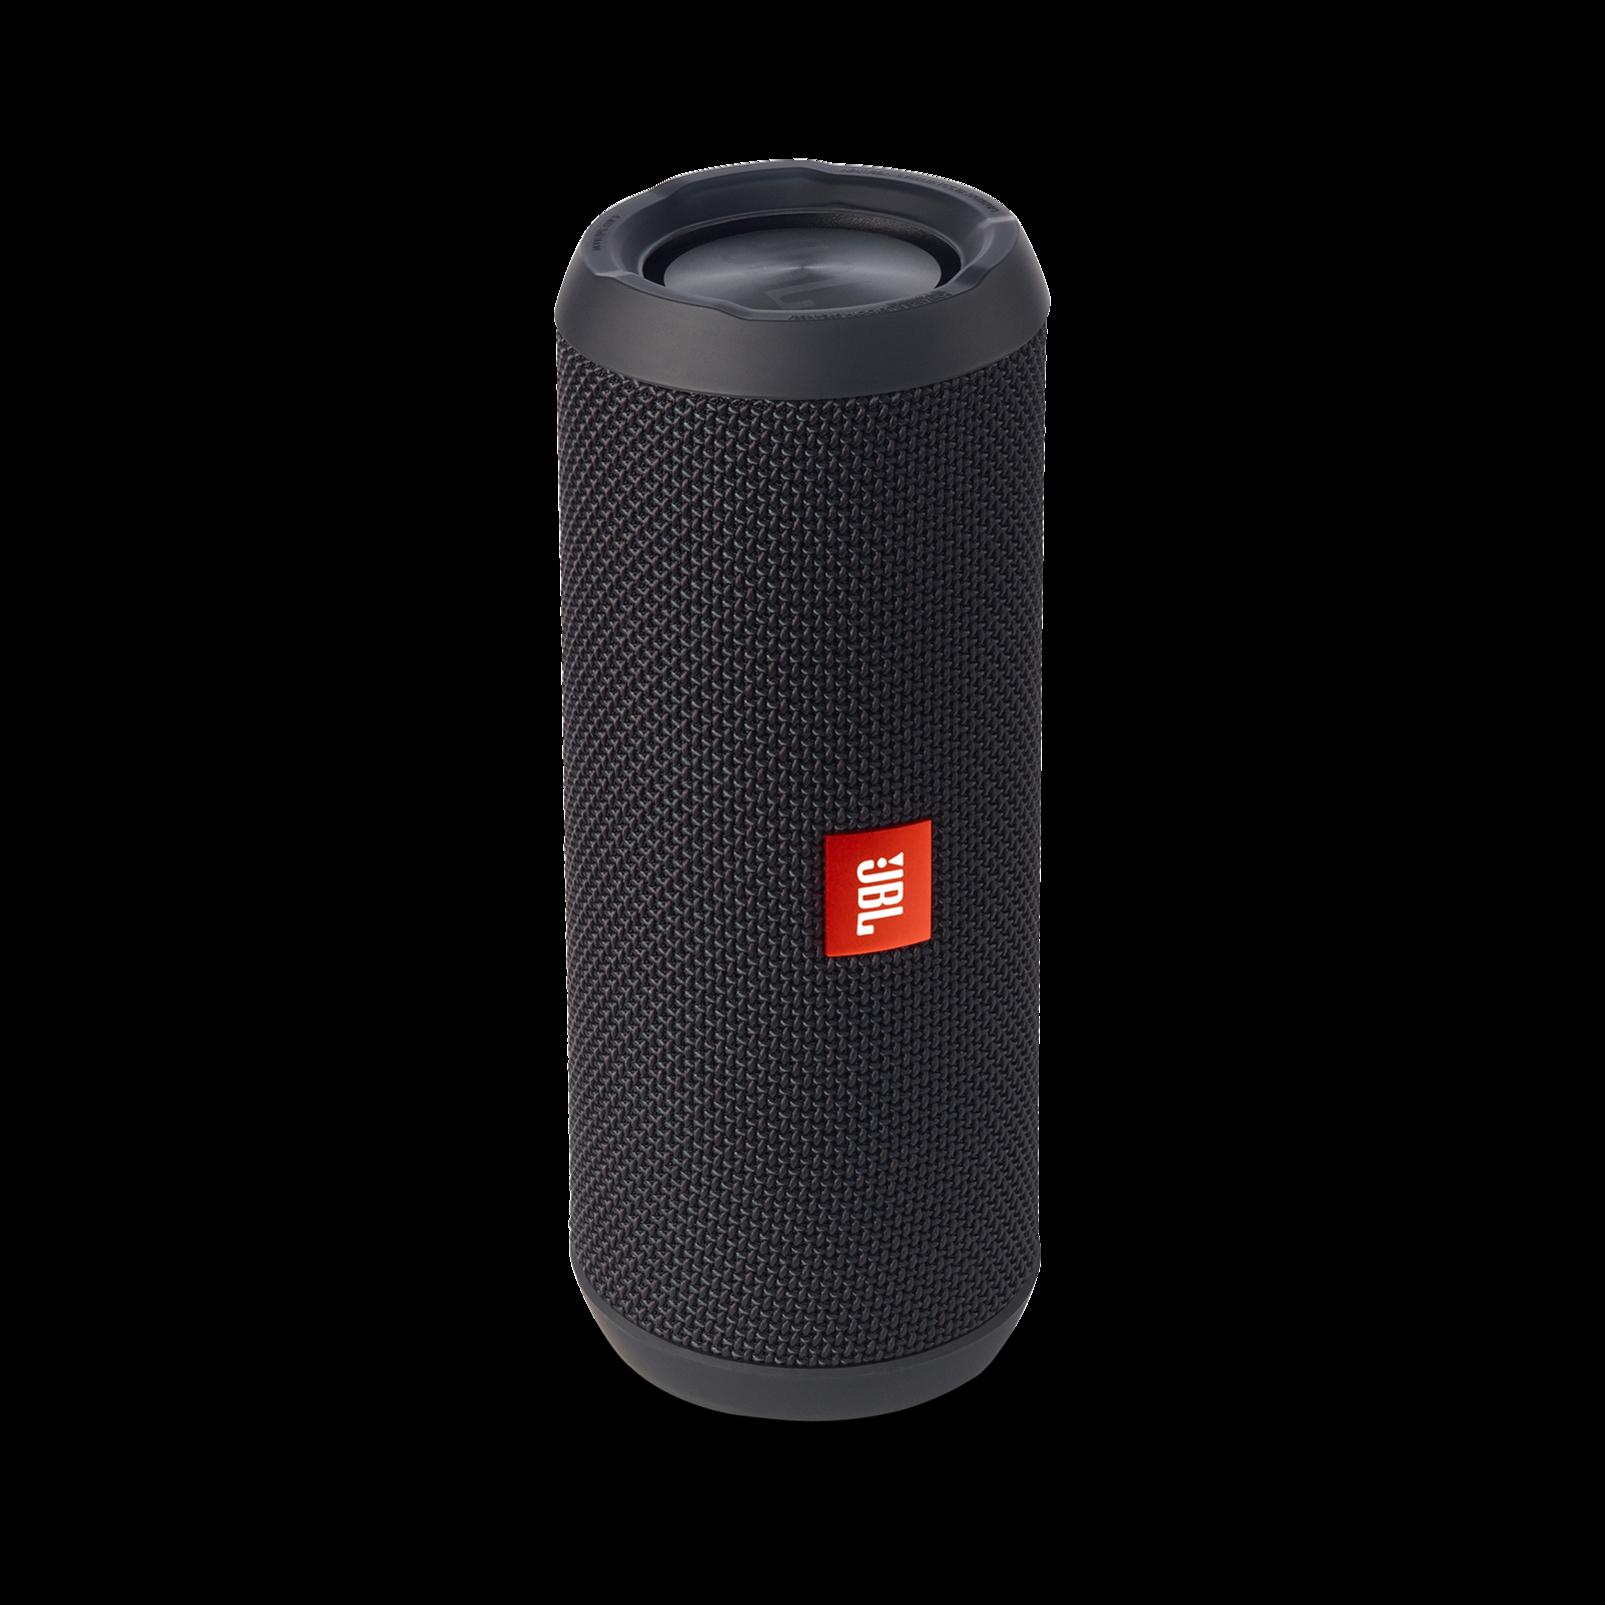 JBL Flip 3 - Black - Splashproof portable Bluetooth speaker with powerful sound and speakerphone technology - Detailshot 2